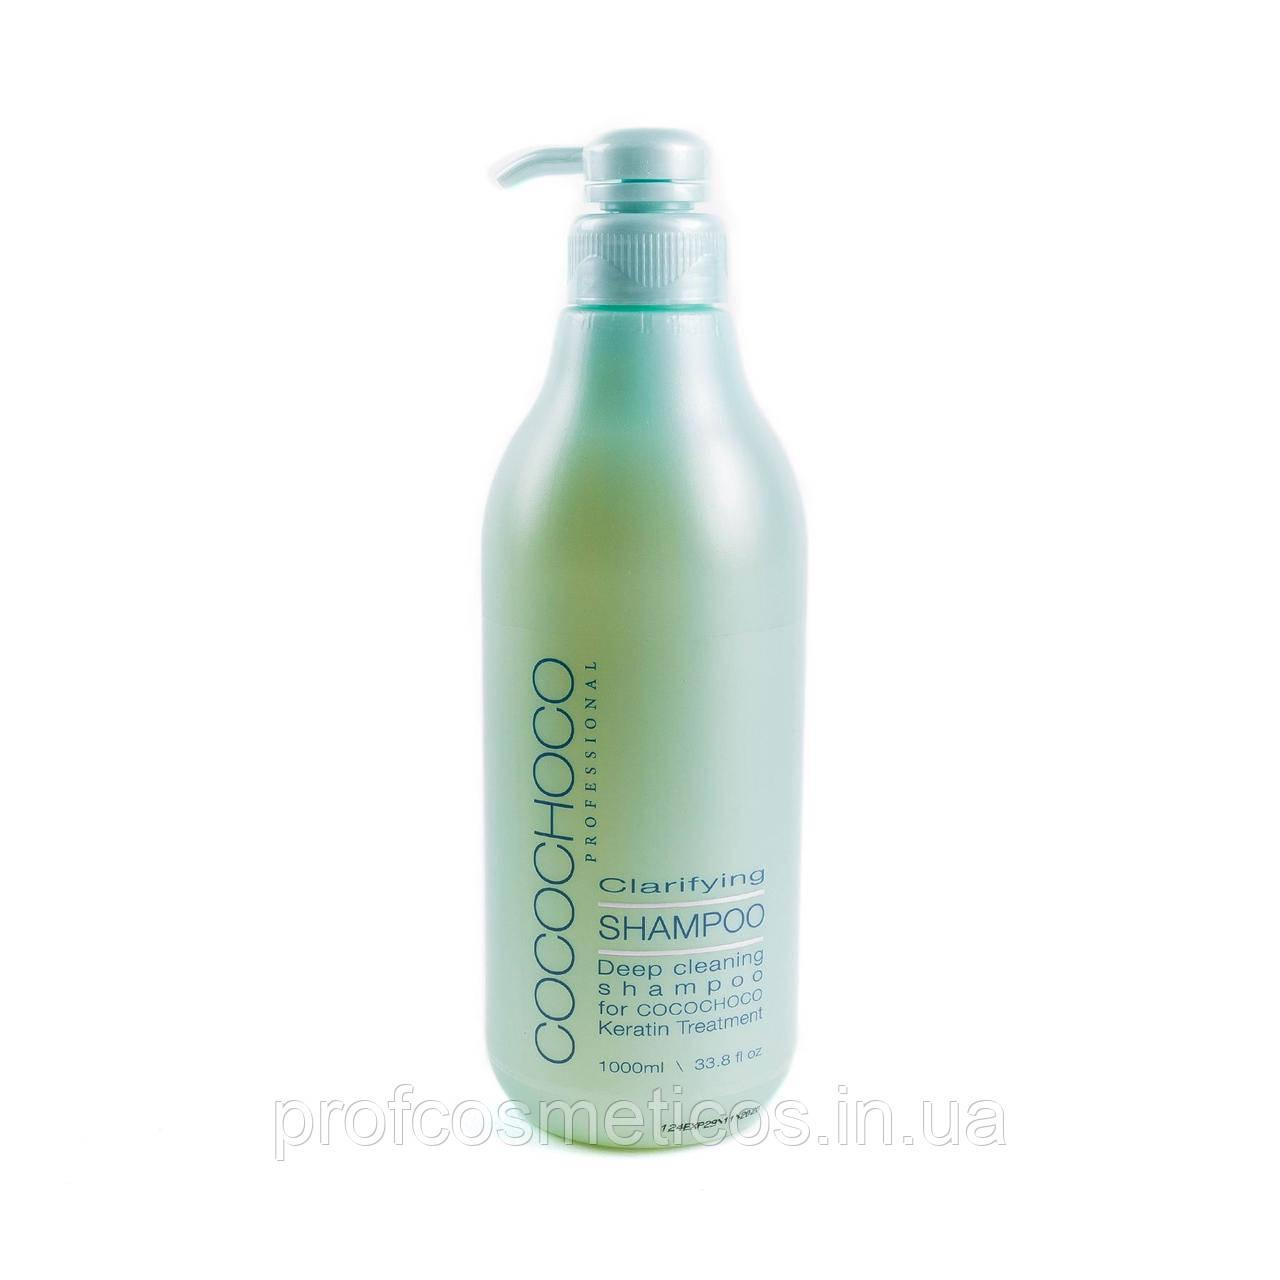 Шампунь глубокой очистки Cocochoco Clarifying Shampoo, 1000 мл